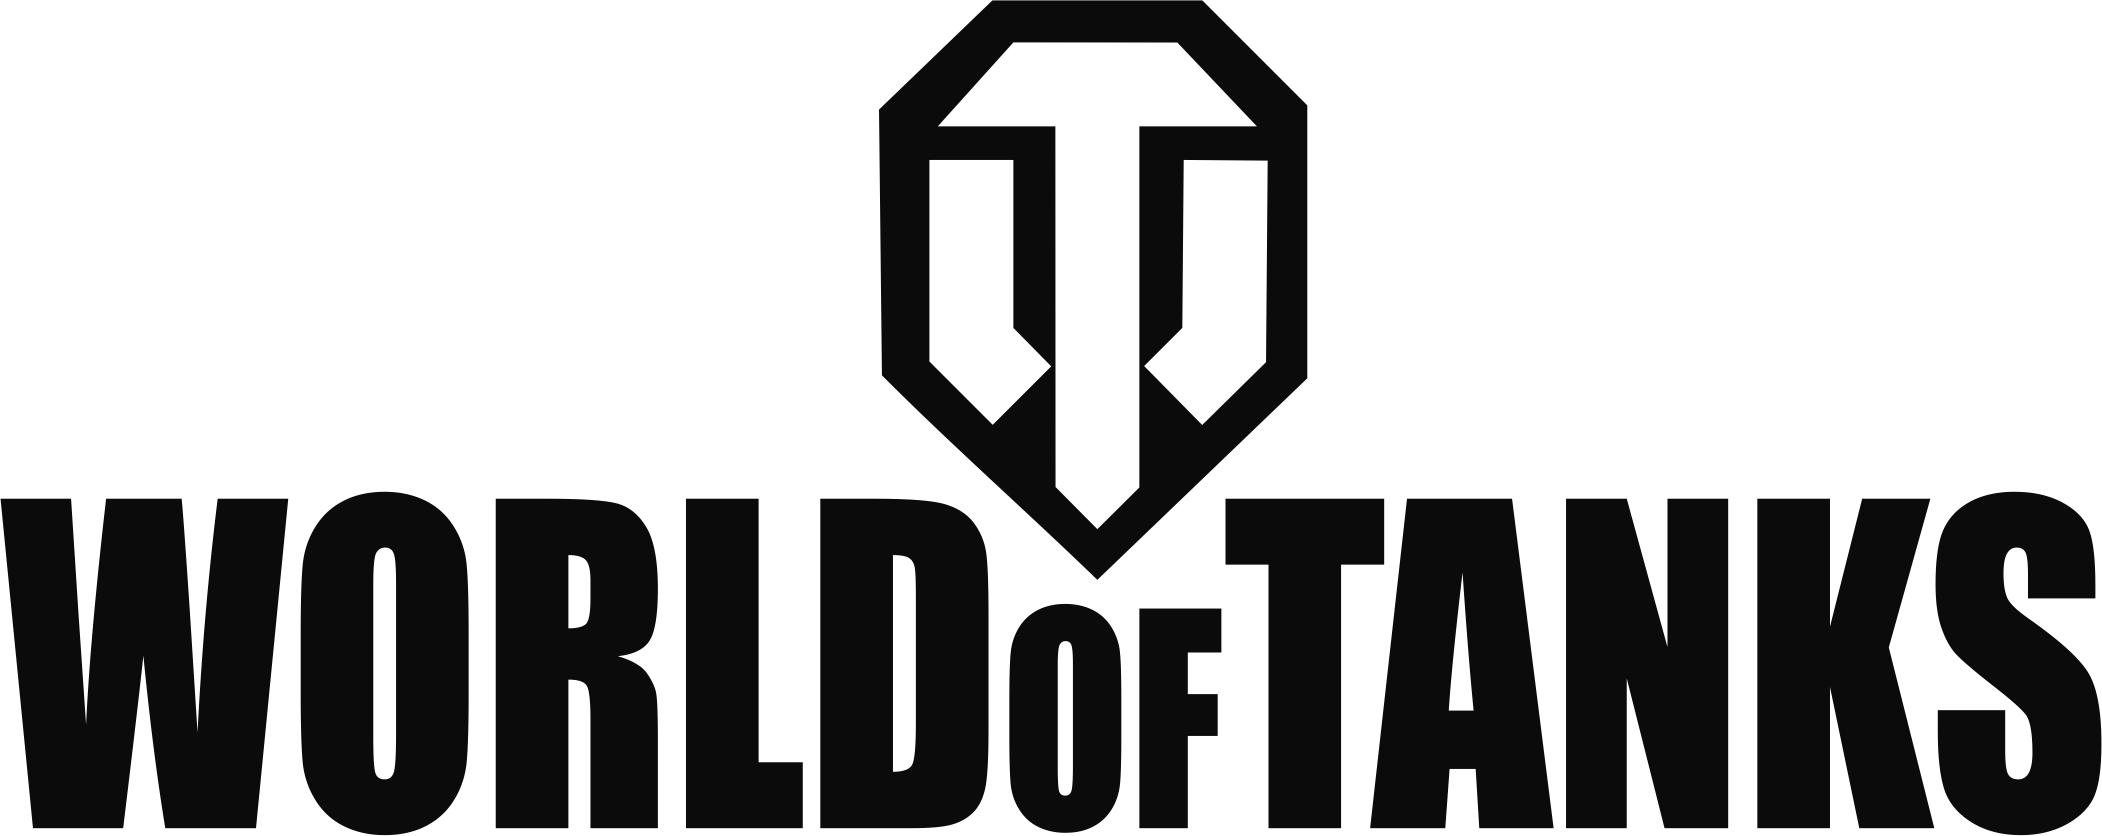 2102x836 World Of Tanks Vector Logo Free Vector Download